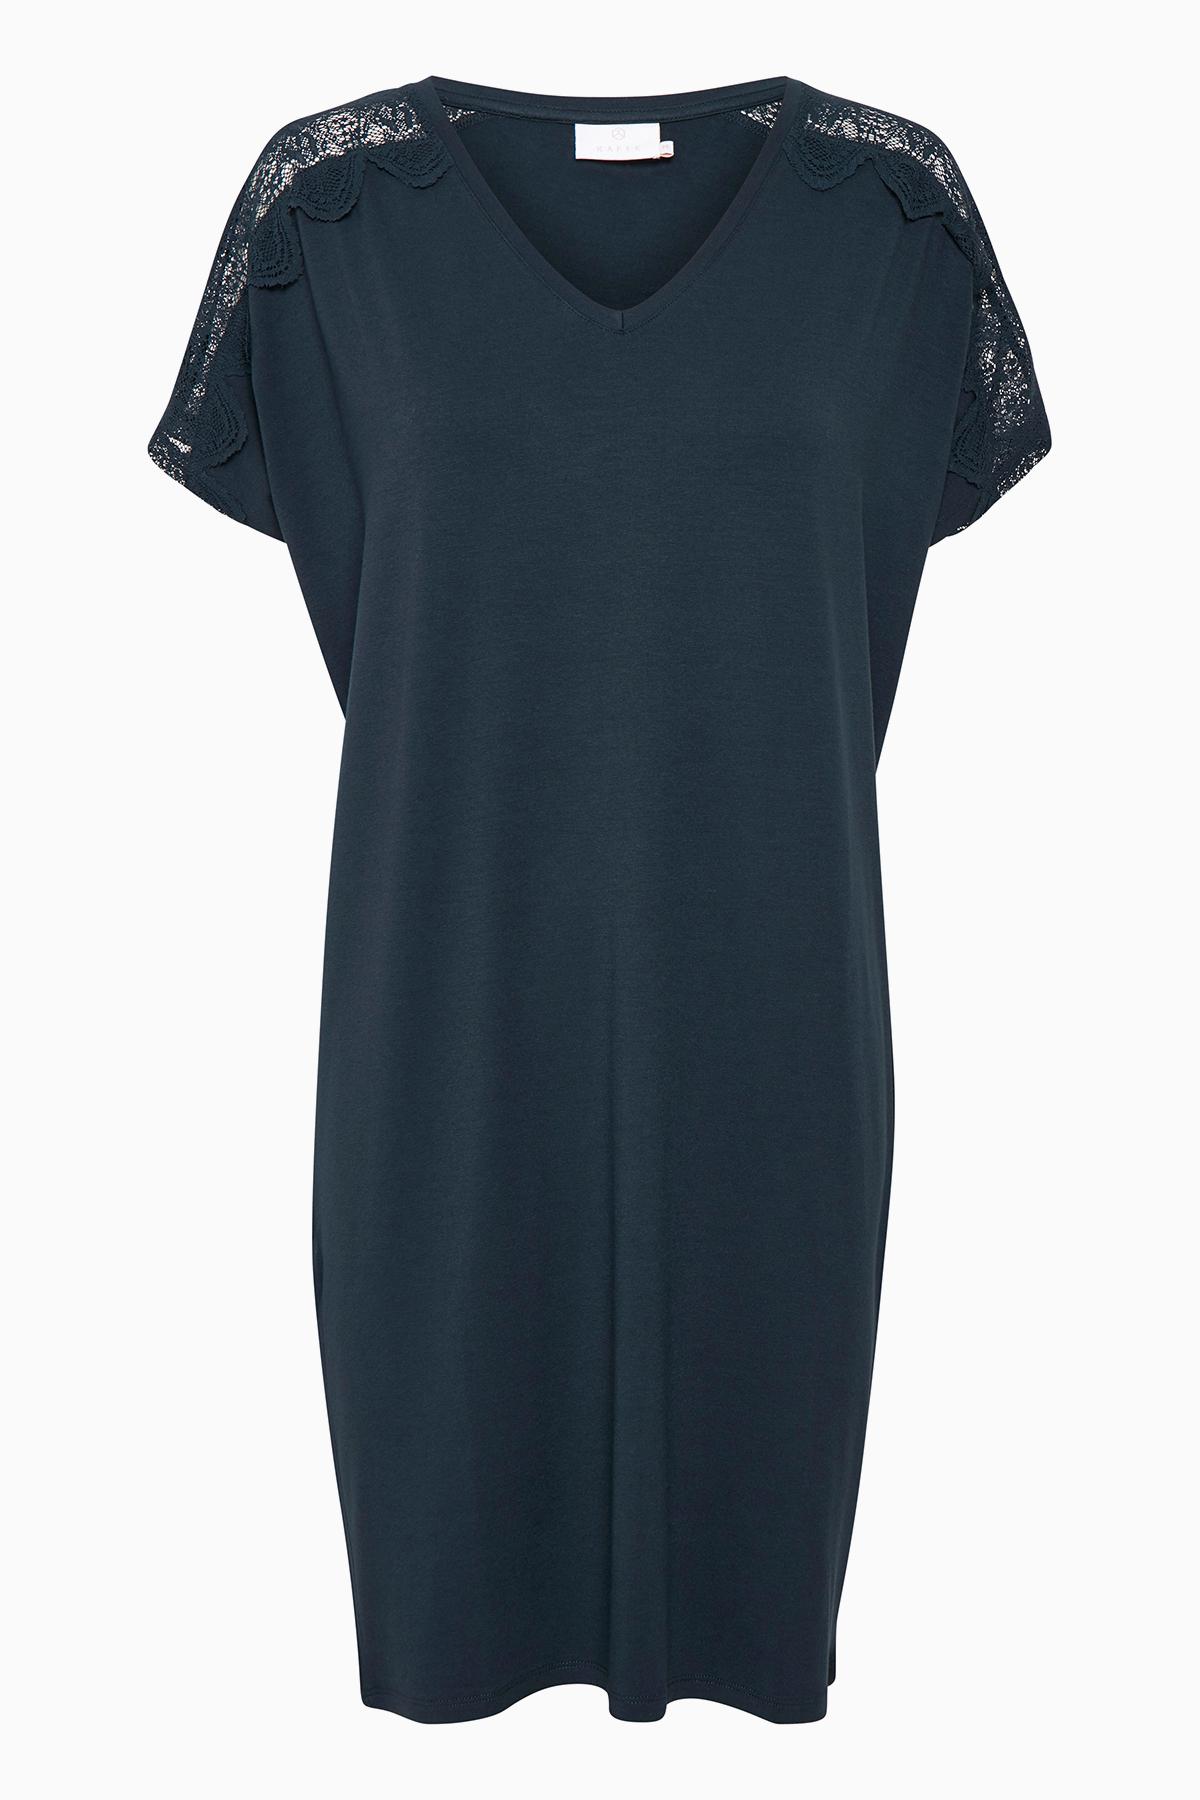 Marineblå Kjole fra Kaffe – Køb Marineblå Kjole fra str. XS-XXL her